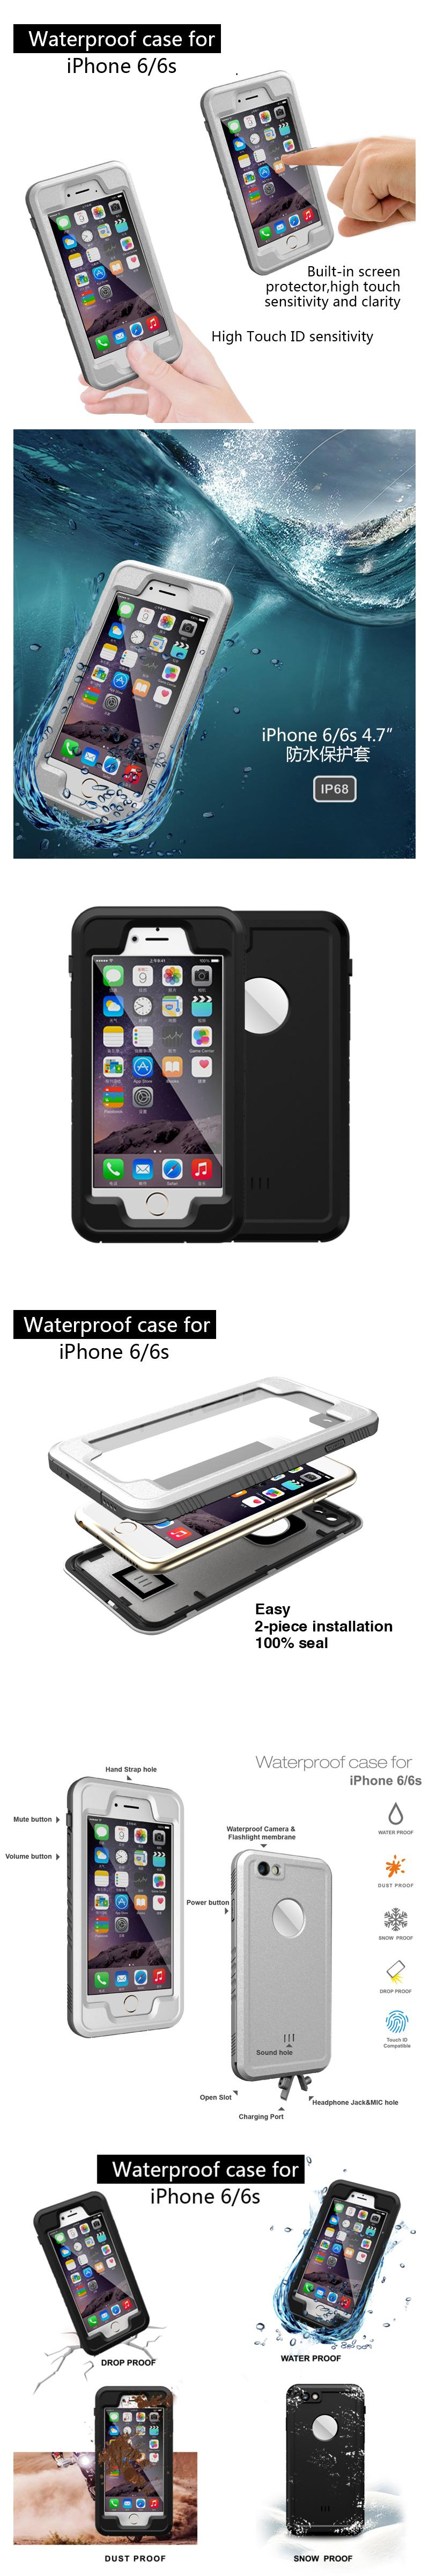 Anti Shock Shockproof Dustproof Underwater Diving Waterproof Phone Love Mei Powerful Bumper Case Xiaomi Mi Note 2 Original 100 Cases Cover For Apple Iphone 6 6s 360